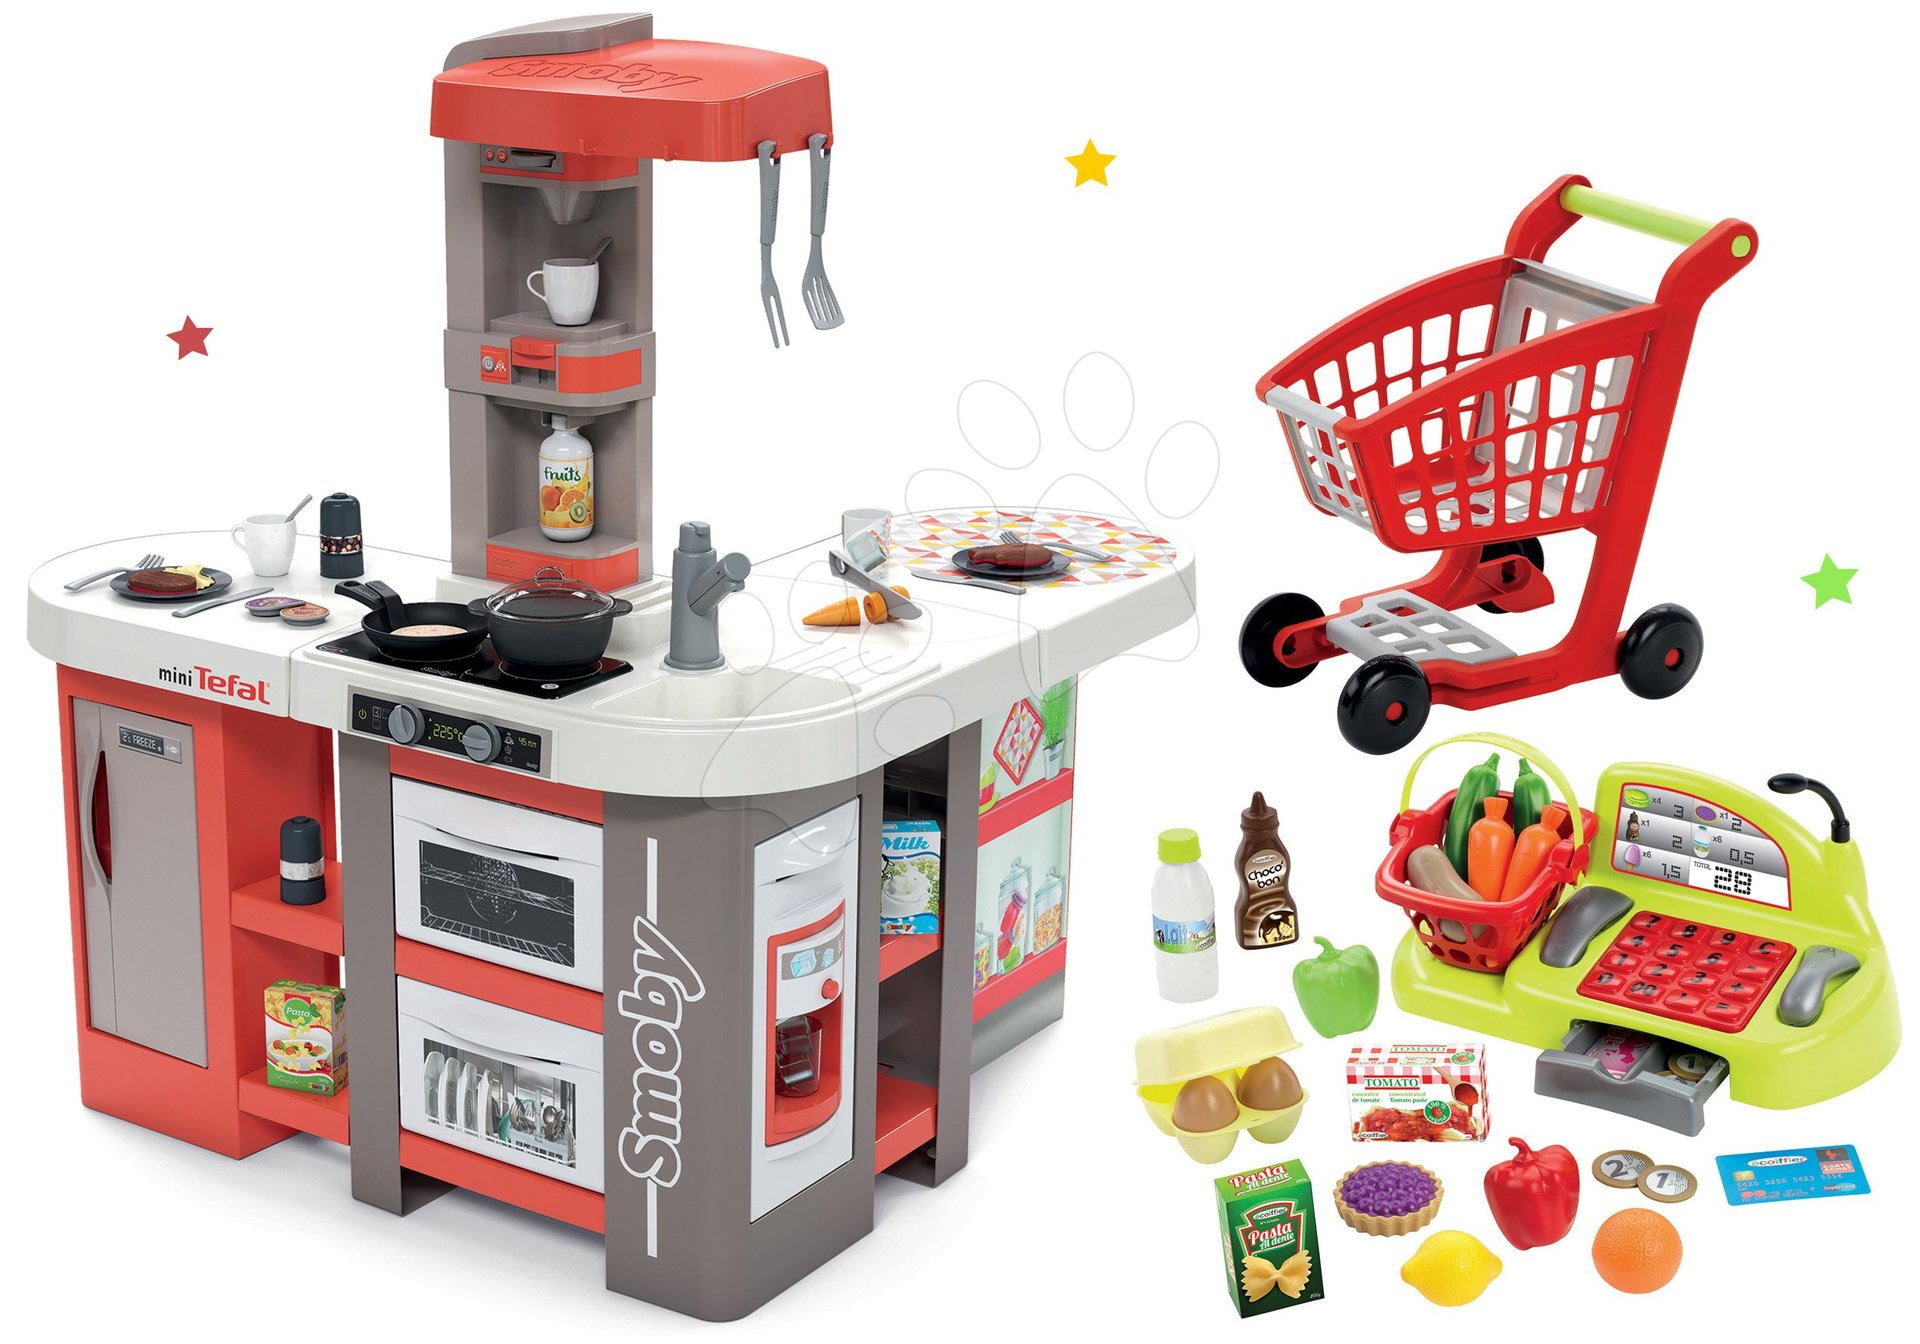 Set kuchynka elektronická Tefal Studio 360° XXL Bubble Smoby mrkvová a pokladňa s nákupným vozíkom a potravinami